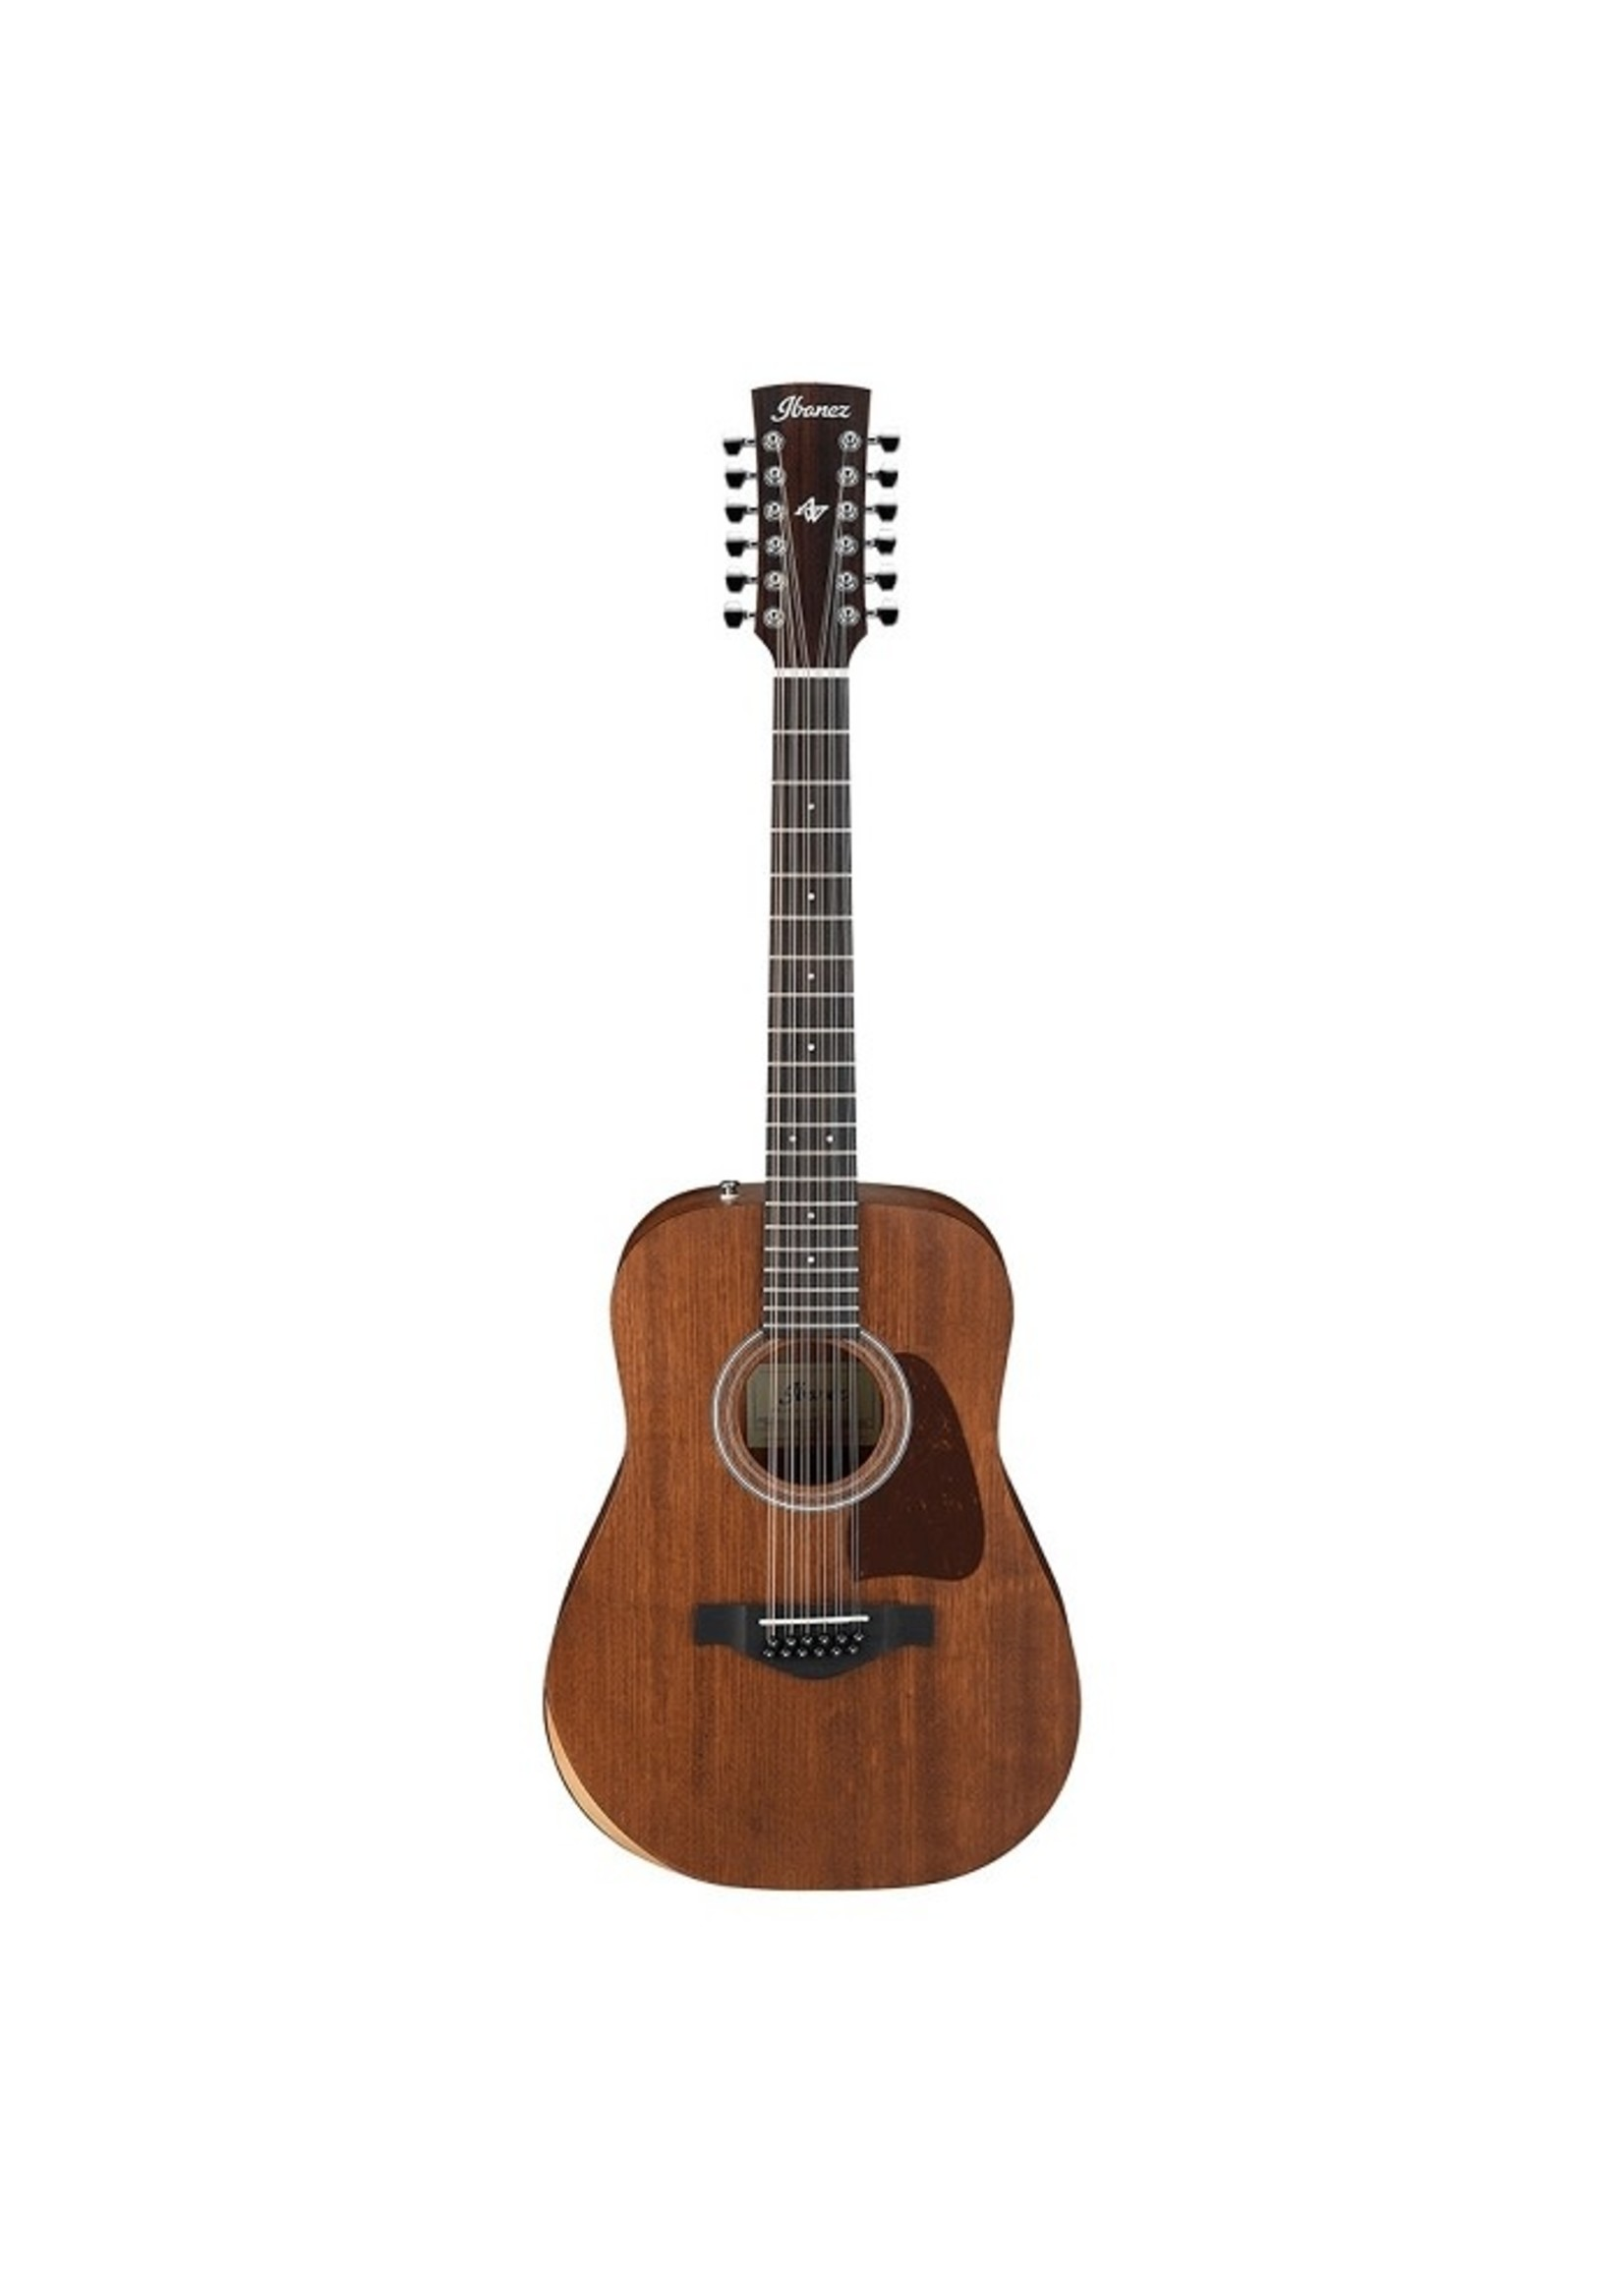 IBANEZ Ibanez Artwood 12-String Acoustic Guitar w/Gigbag